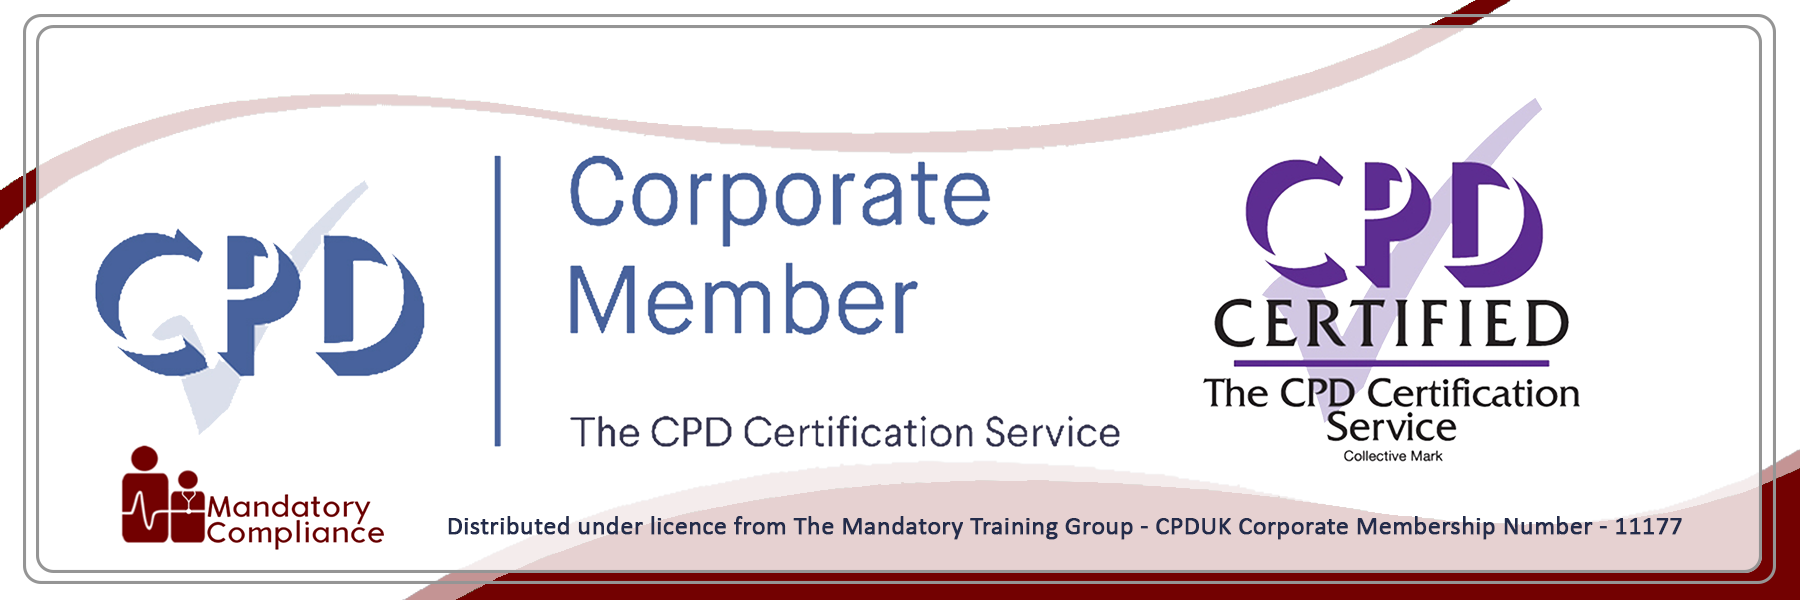 Mastering Microsoft Excel 2016 - E-Learning Courses - Mandatory Compliance UK -